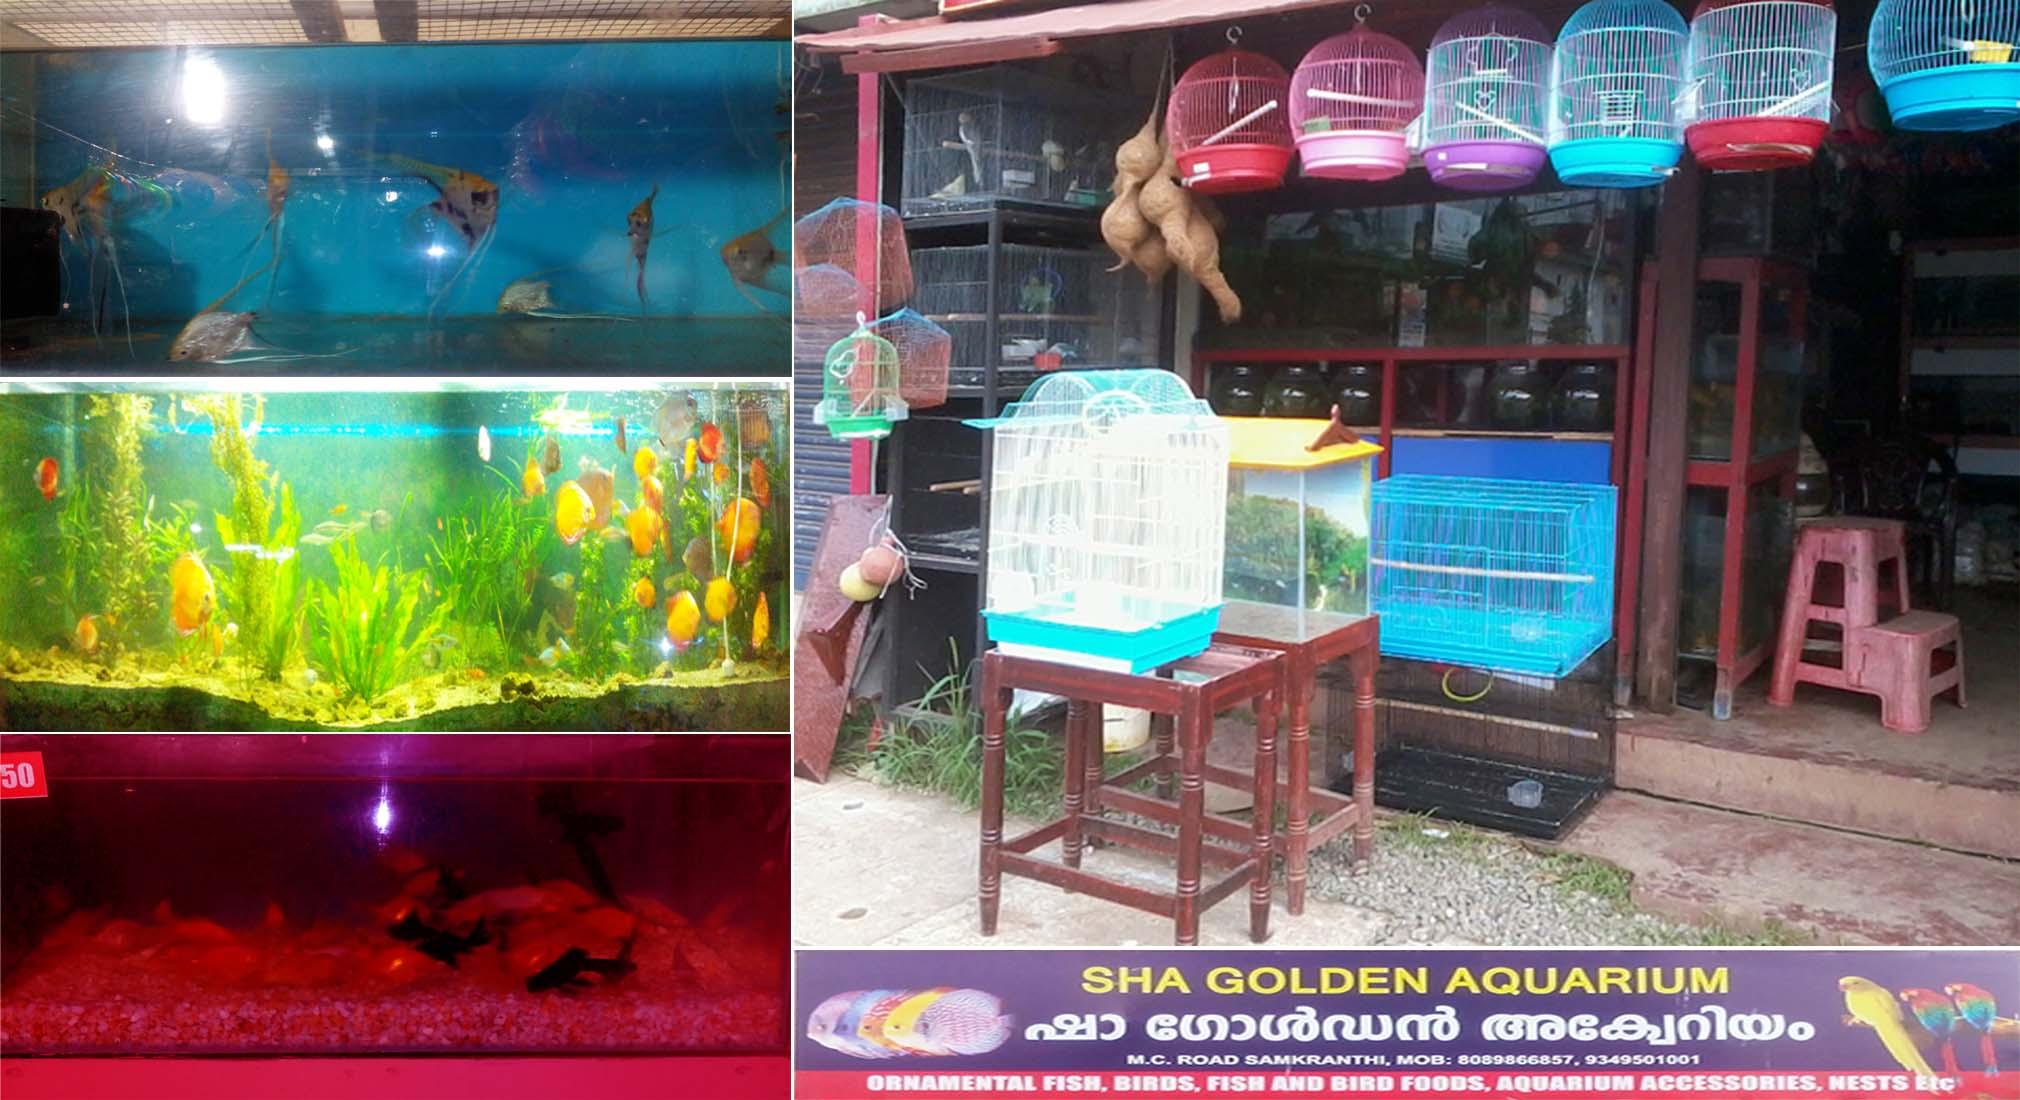 Fish aquarium in gurgaon - Sha Golden Aquarium Fishes And Lovebirds Shop In Kottayam Sankranthi Kerala